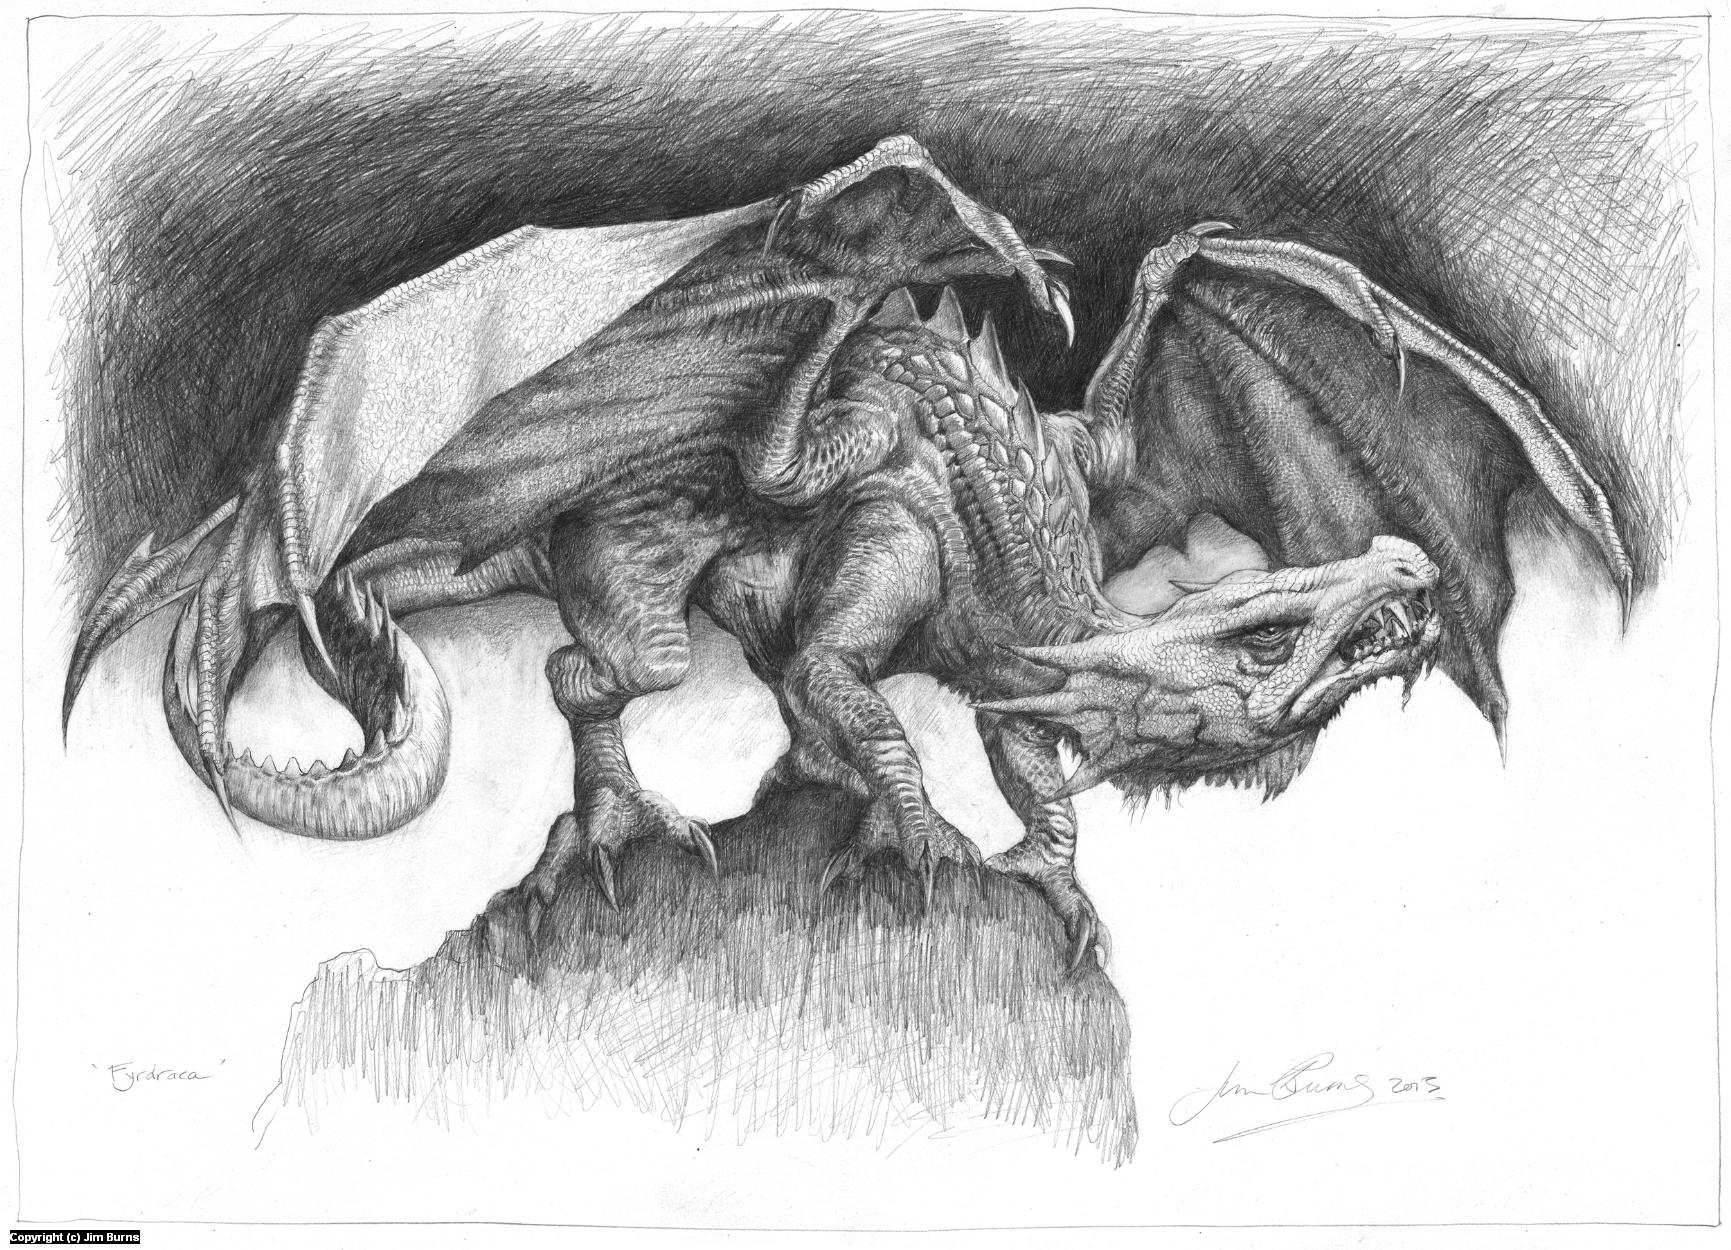 'Fyrdraca' Artwork by Jim Burns